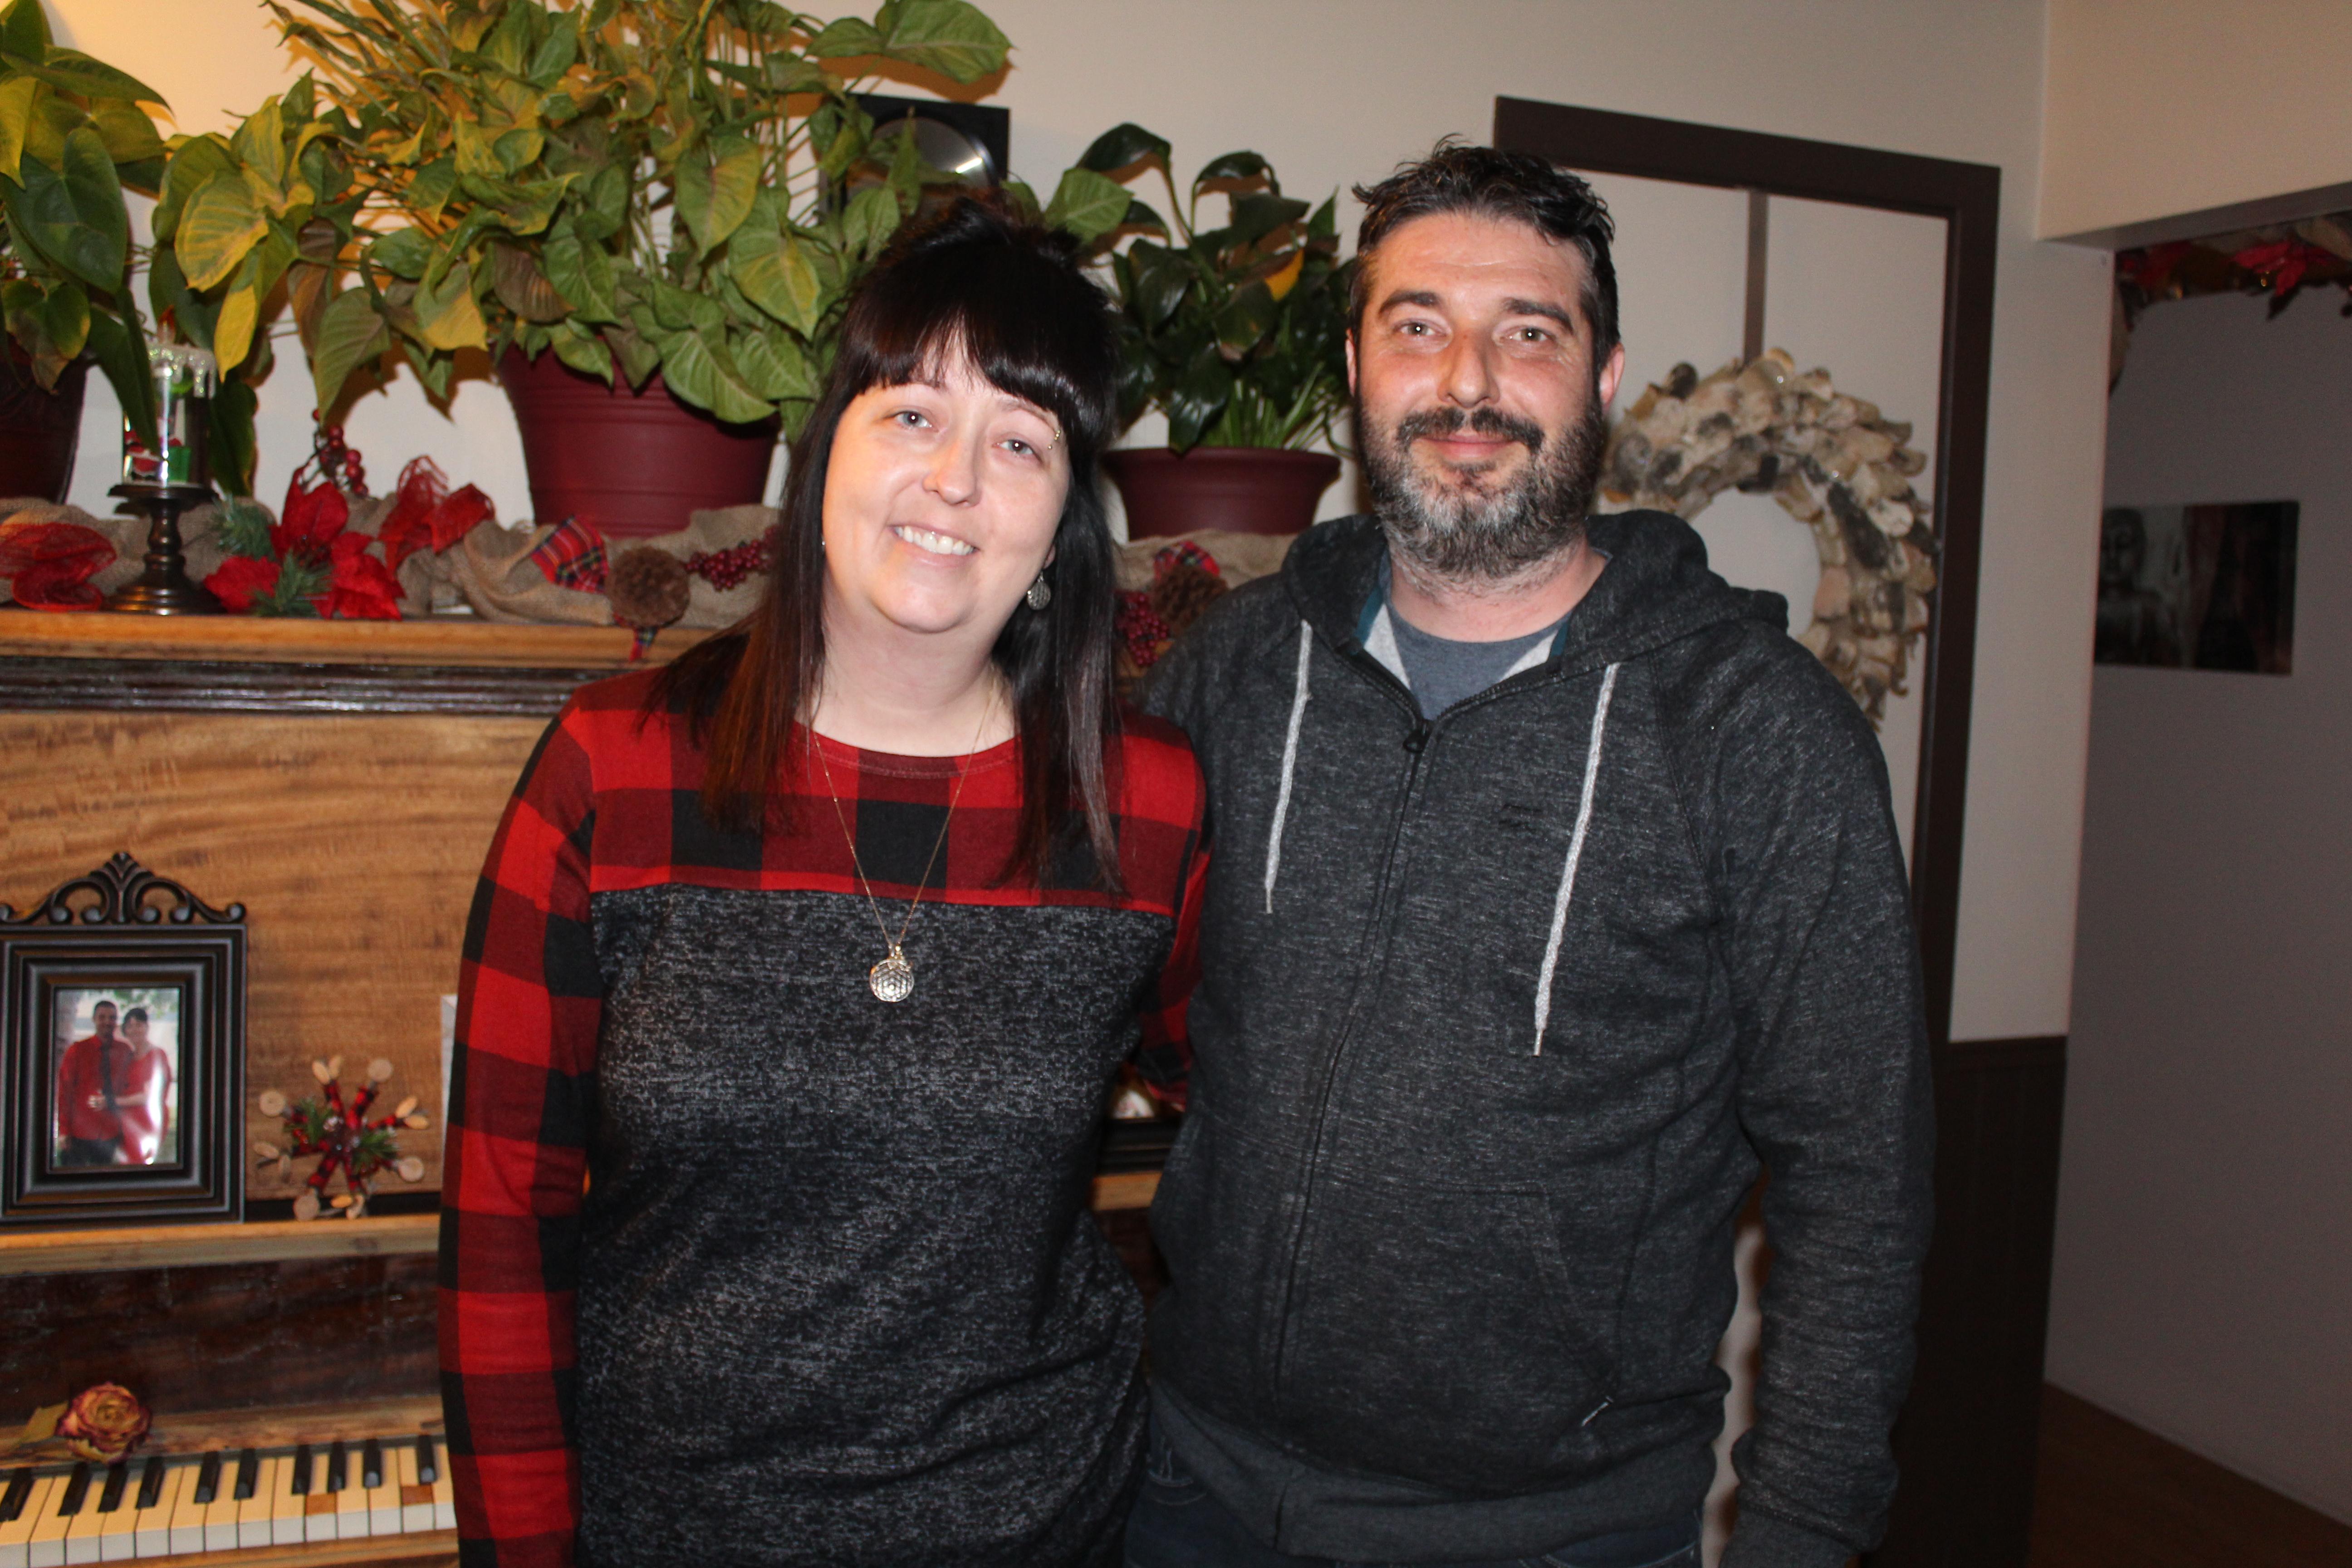 Karyne Huard honore sa promesse d'adolescente faite à sa mère